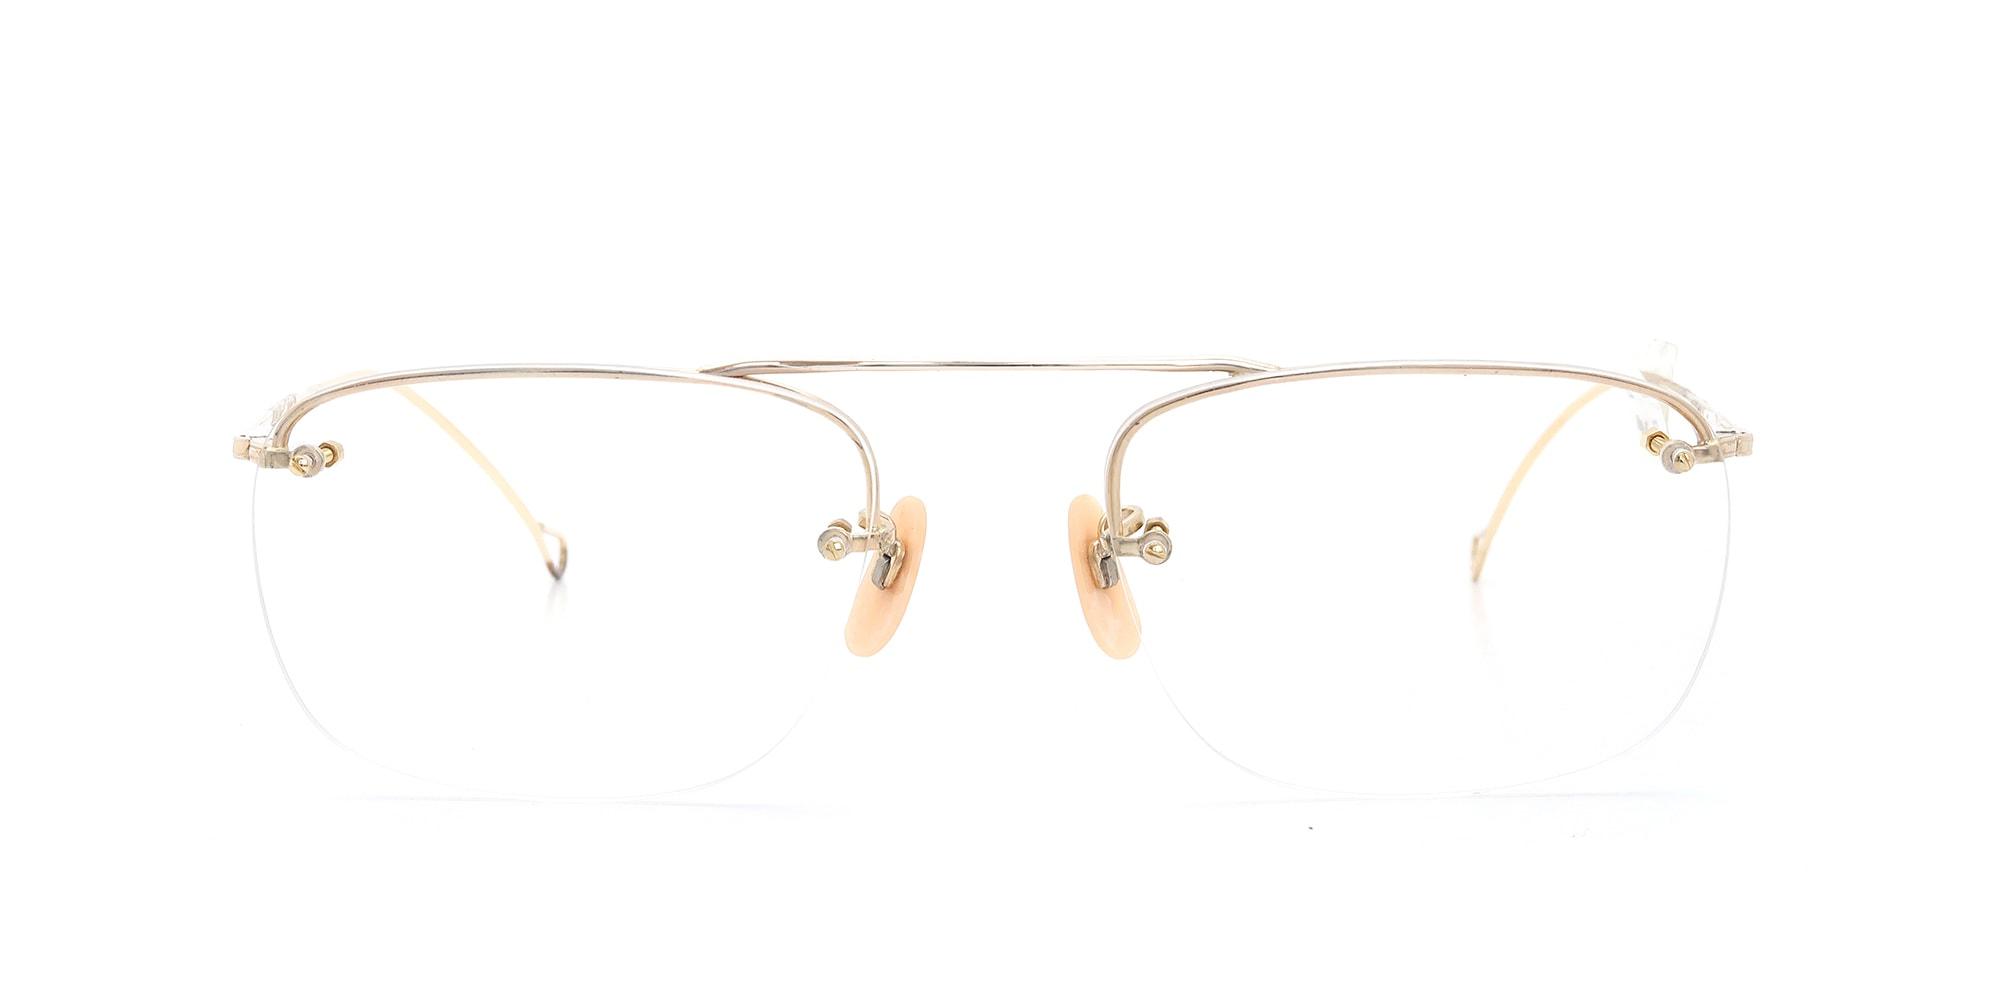 The Spectacle メガネ 1938-1950s SHURON Mid-Century-Modern-Bar SHURSET RIMWAY FUL-VUE 1/10 12KGF イメージ3